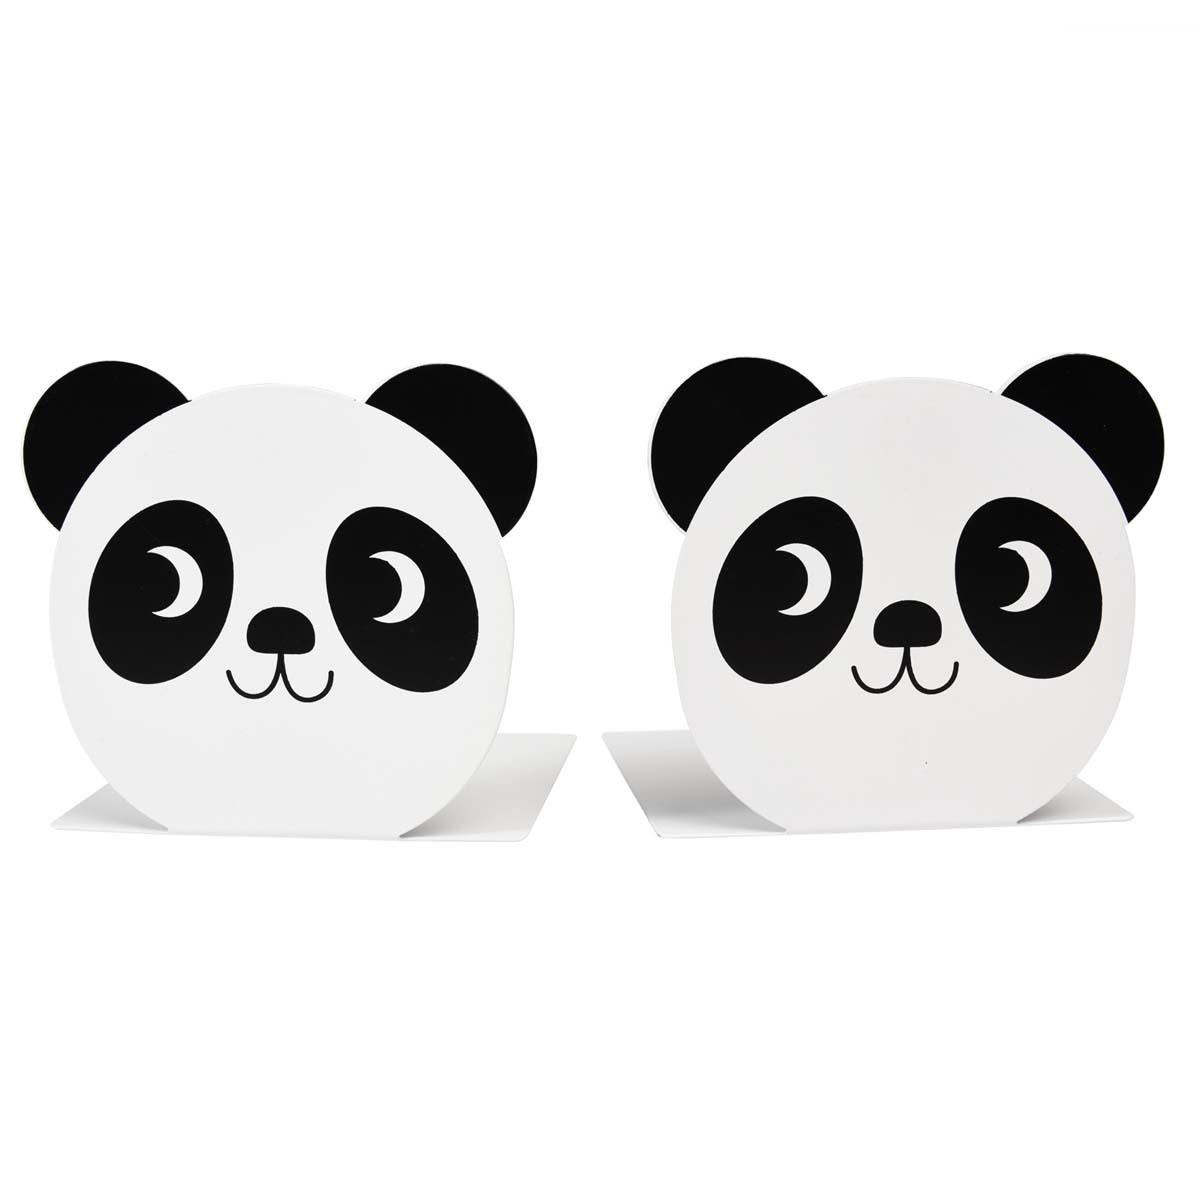 Livre & Carte Serre-Livres Miko le Panda Serre-Livres Miko le Panda